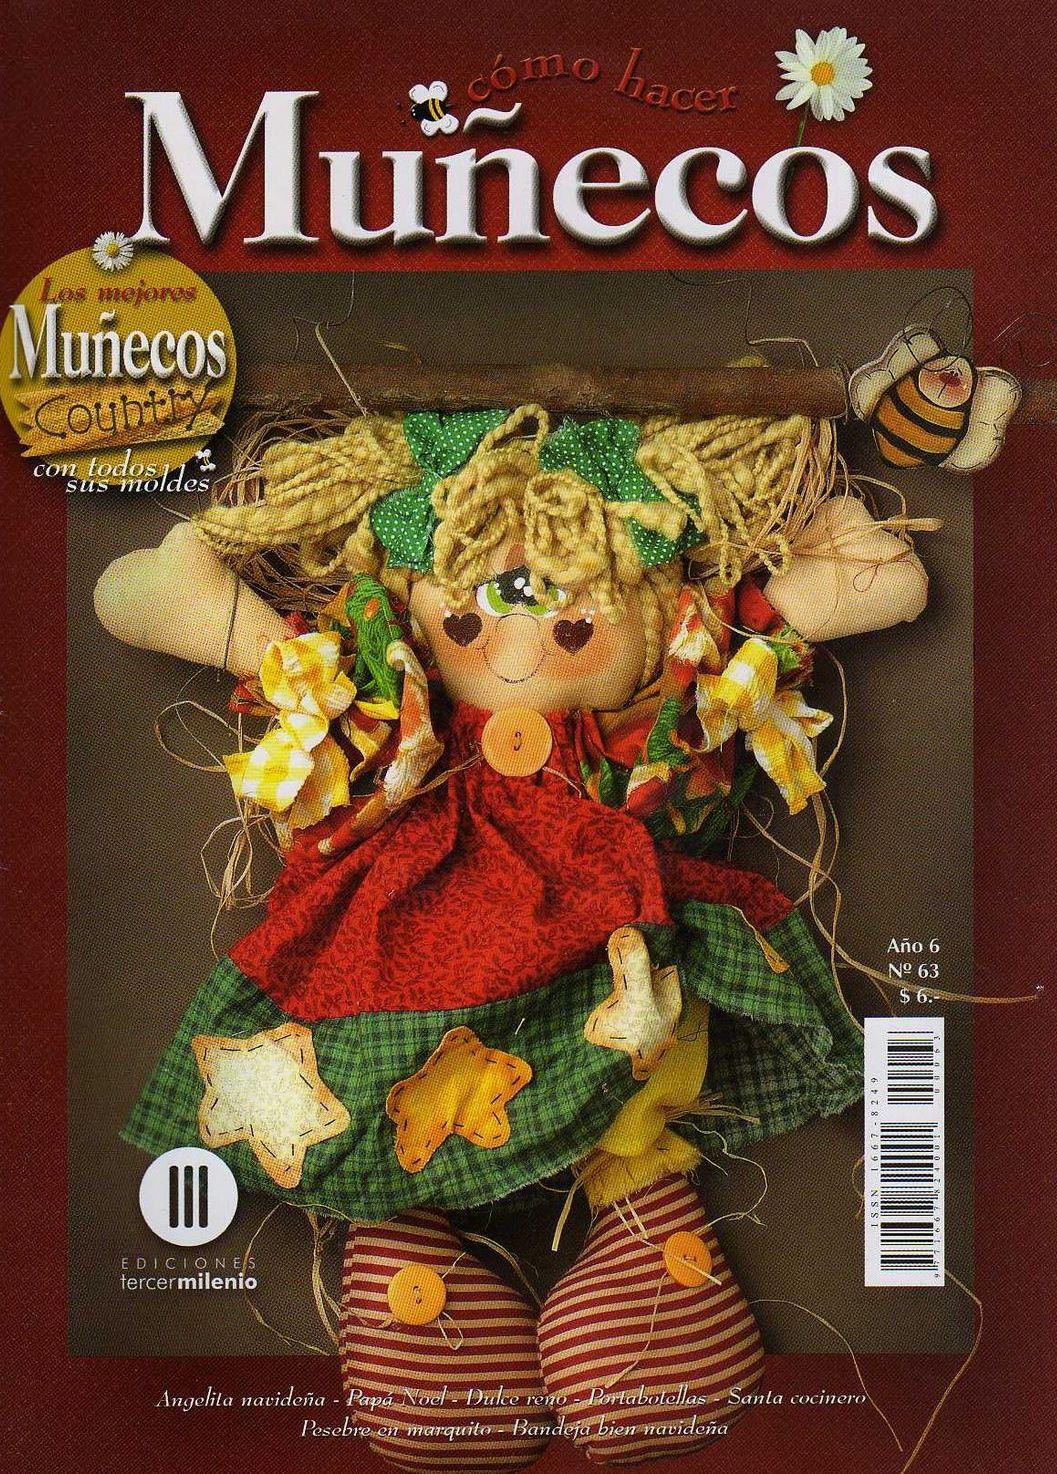 ... 1474 jpeg 475kB, Muecos Country Navideos Moldes De Muecos Country